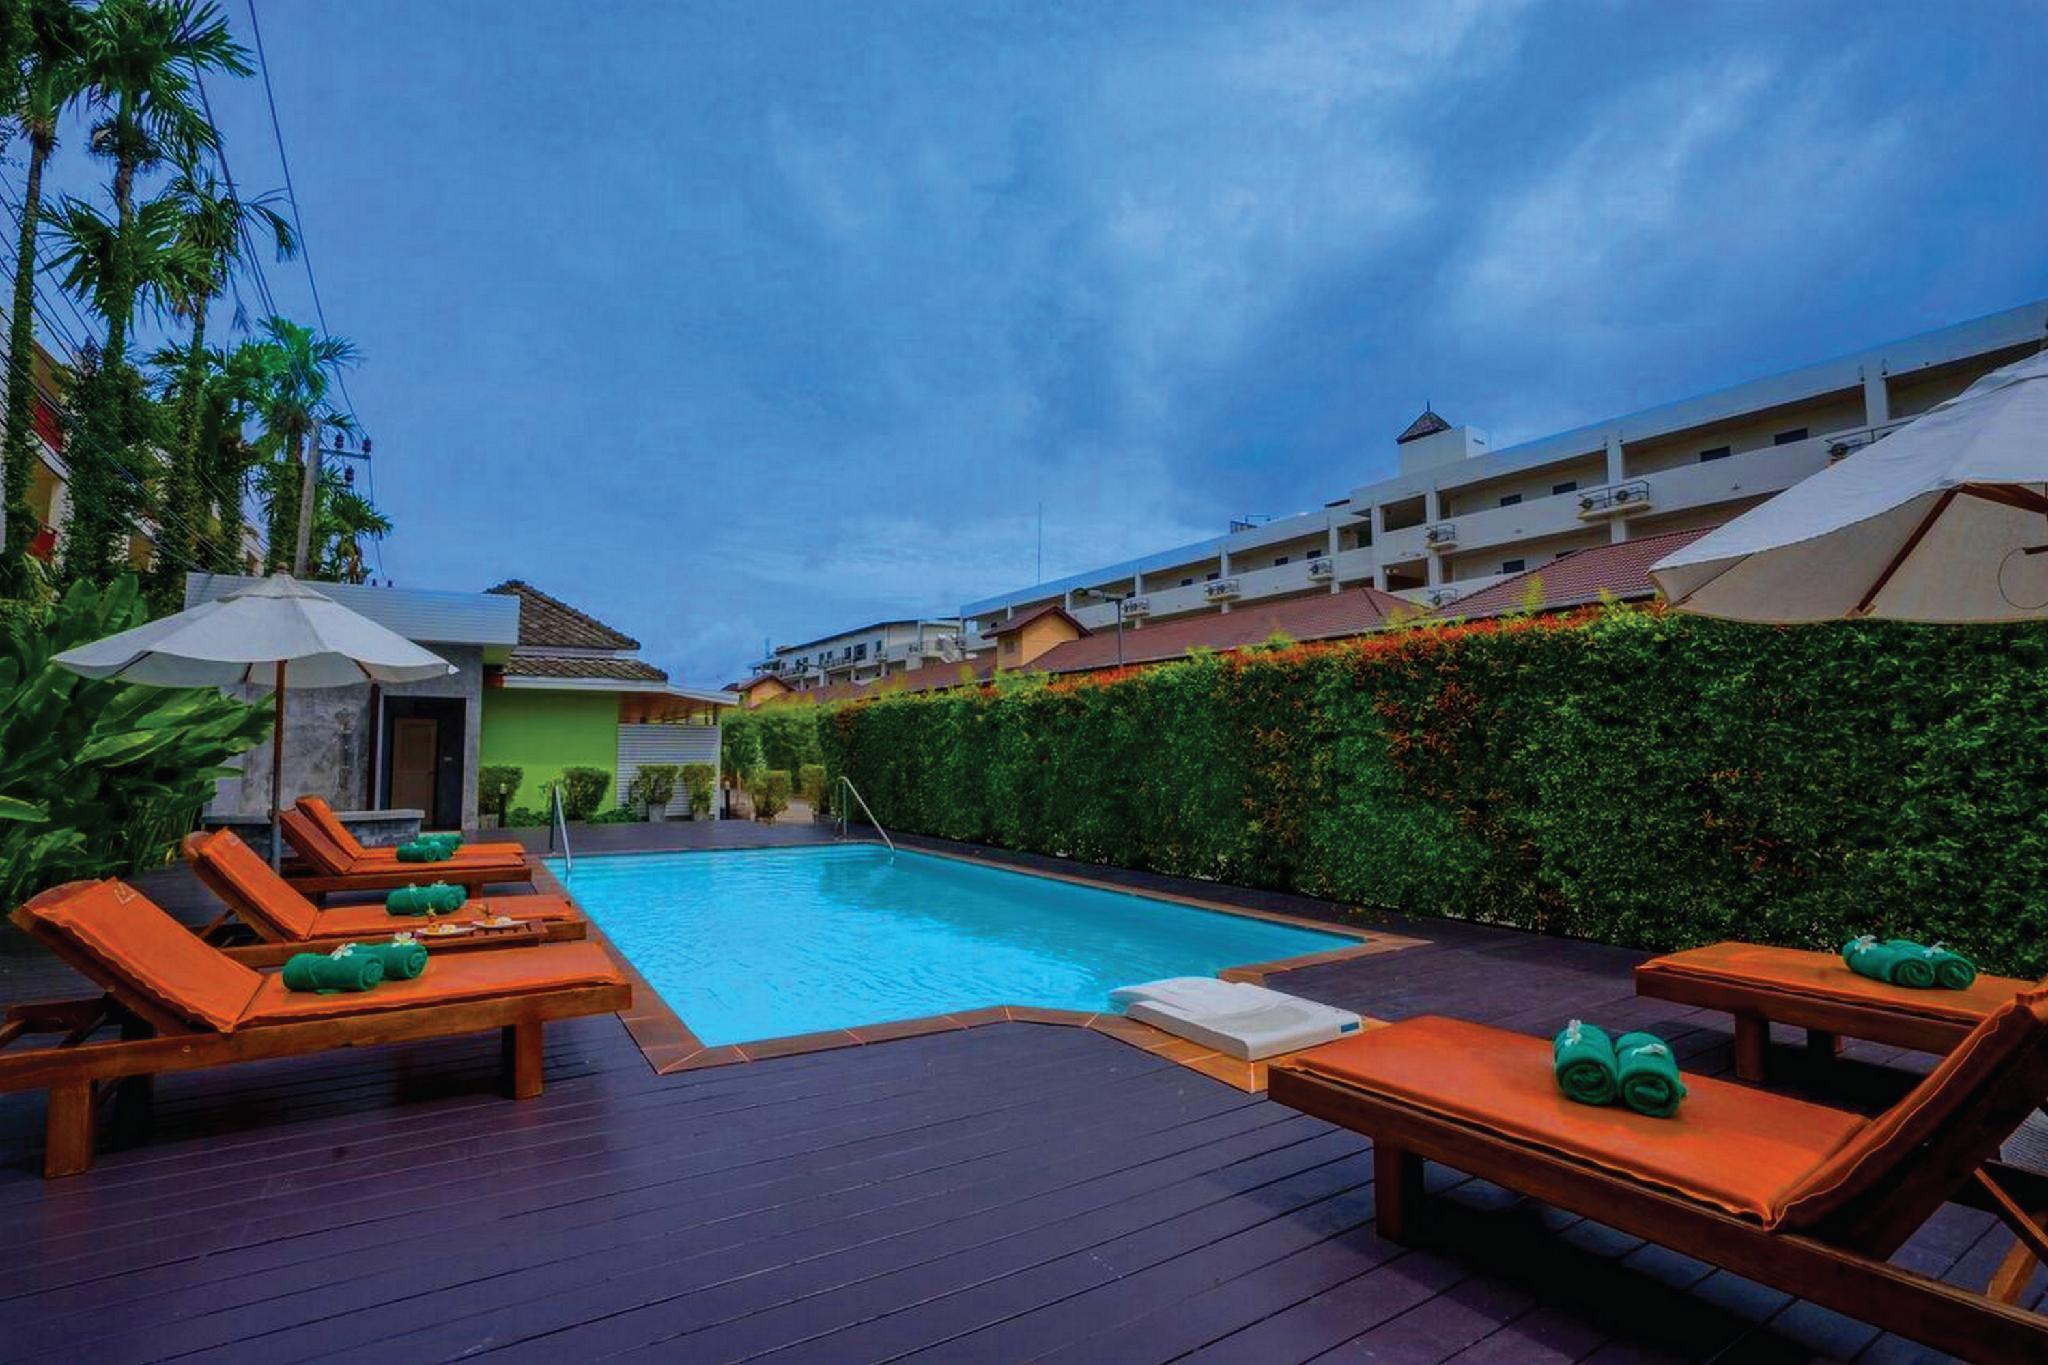 Simply Resort By Metadee ซิมพลี รีสอร์ต บาย เมทาดี